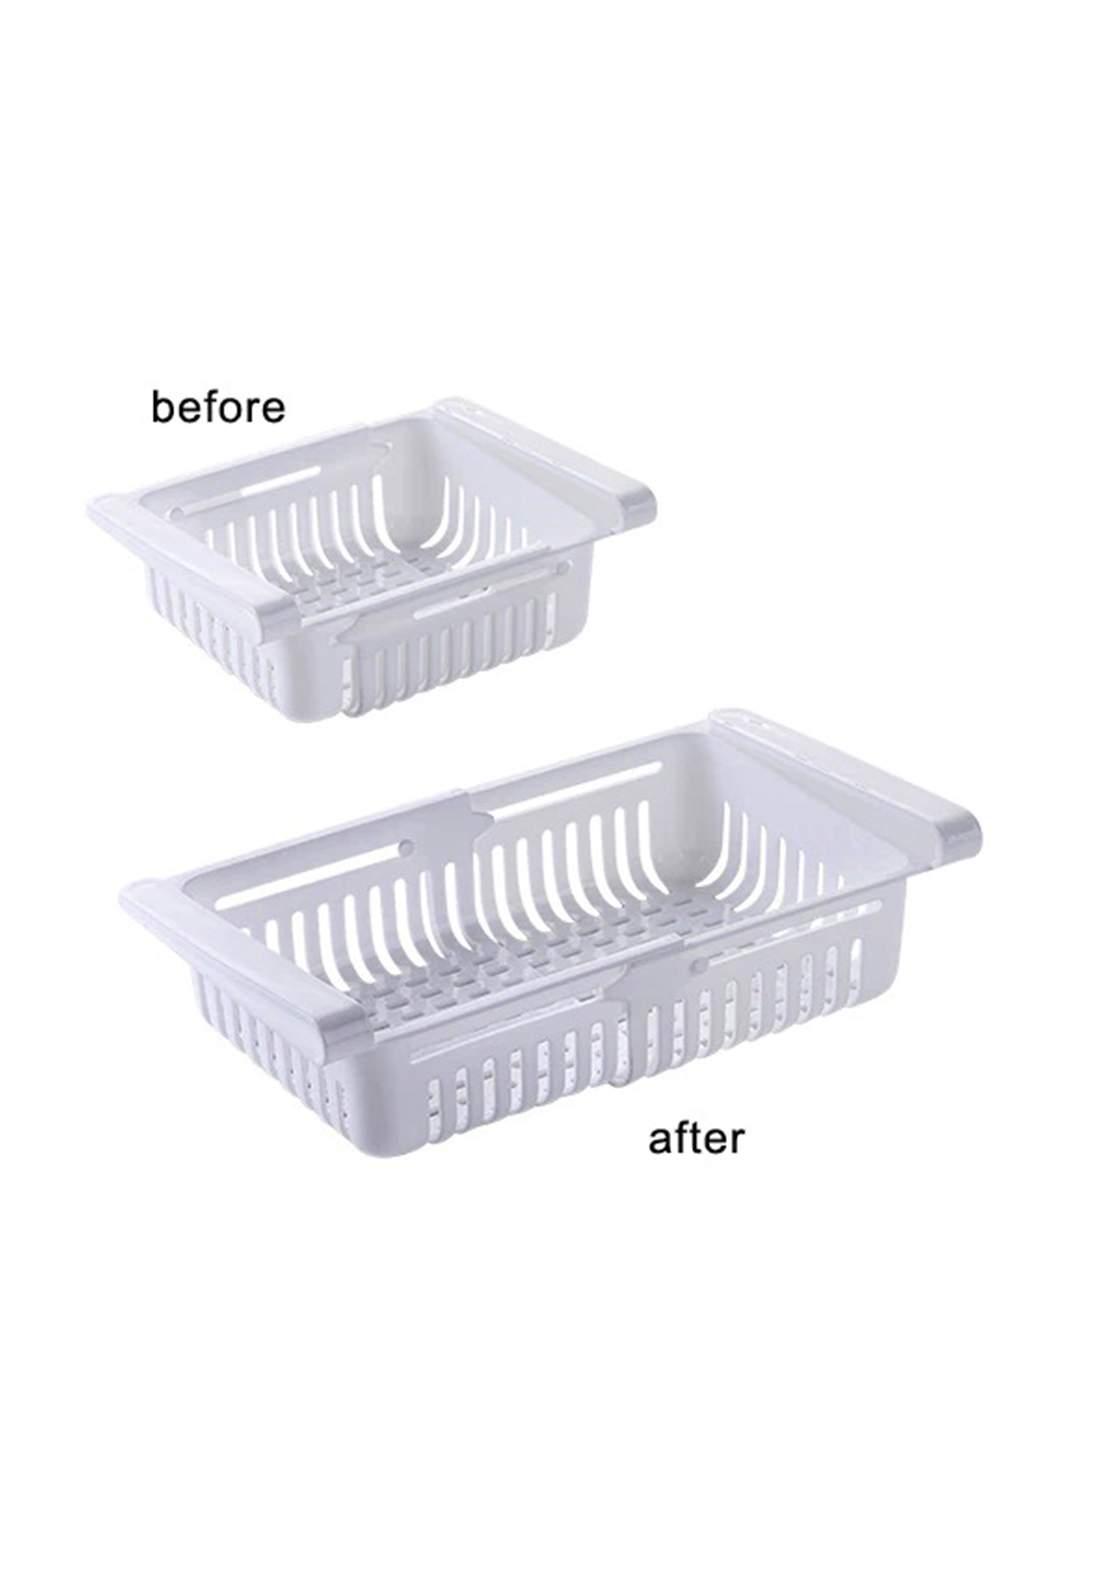 Adjustable Kitchen Organizer  مصفي ثالجة مجر سلايد 11-20